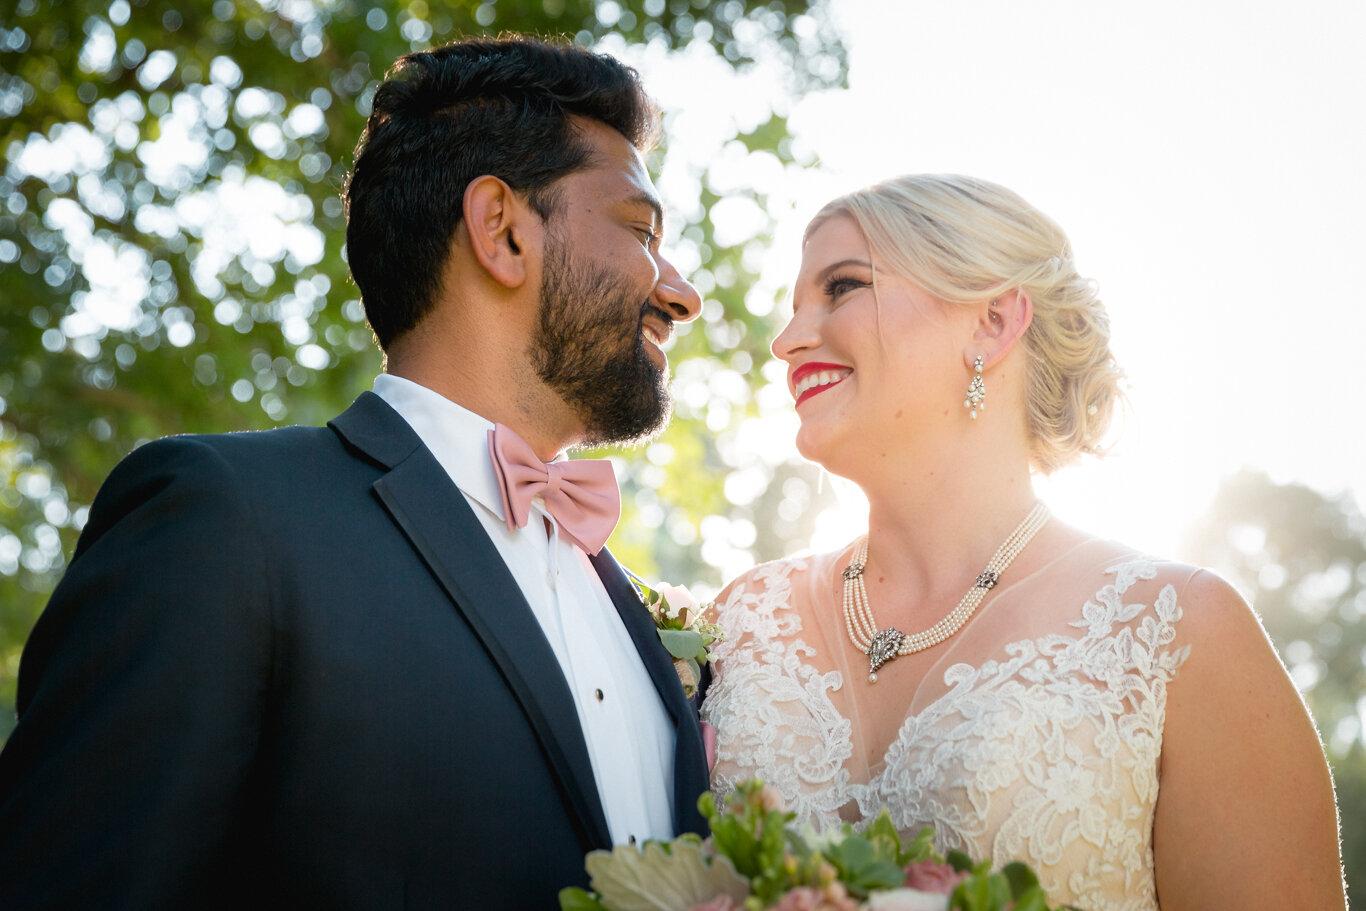 2019.08.24_Emily-Ashir-Wedding-at-the-Maples-6110.jpg